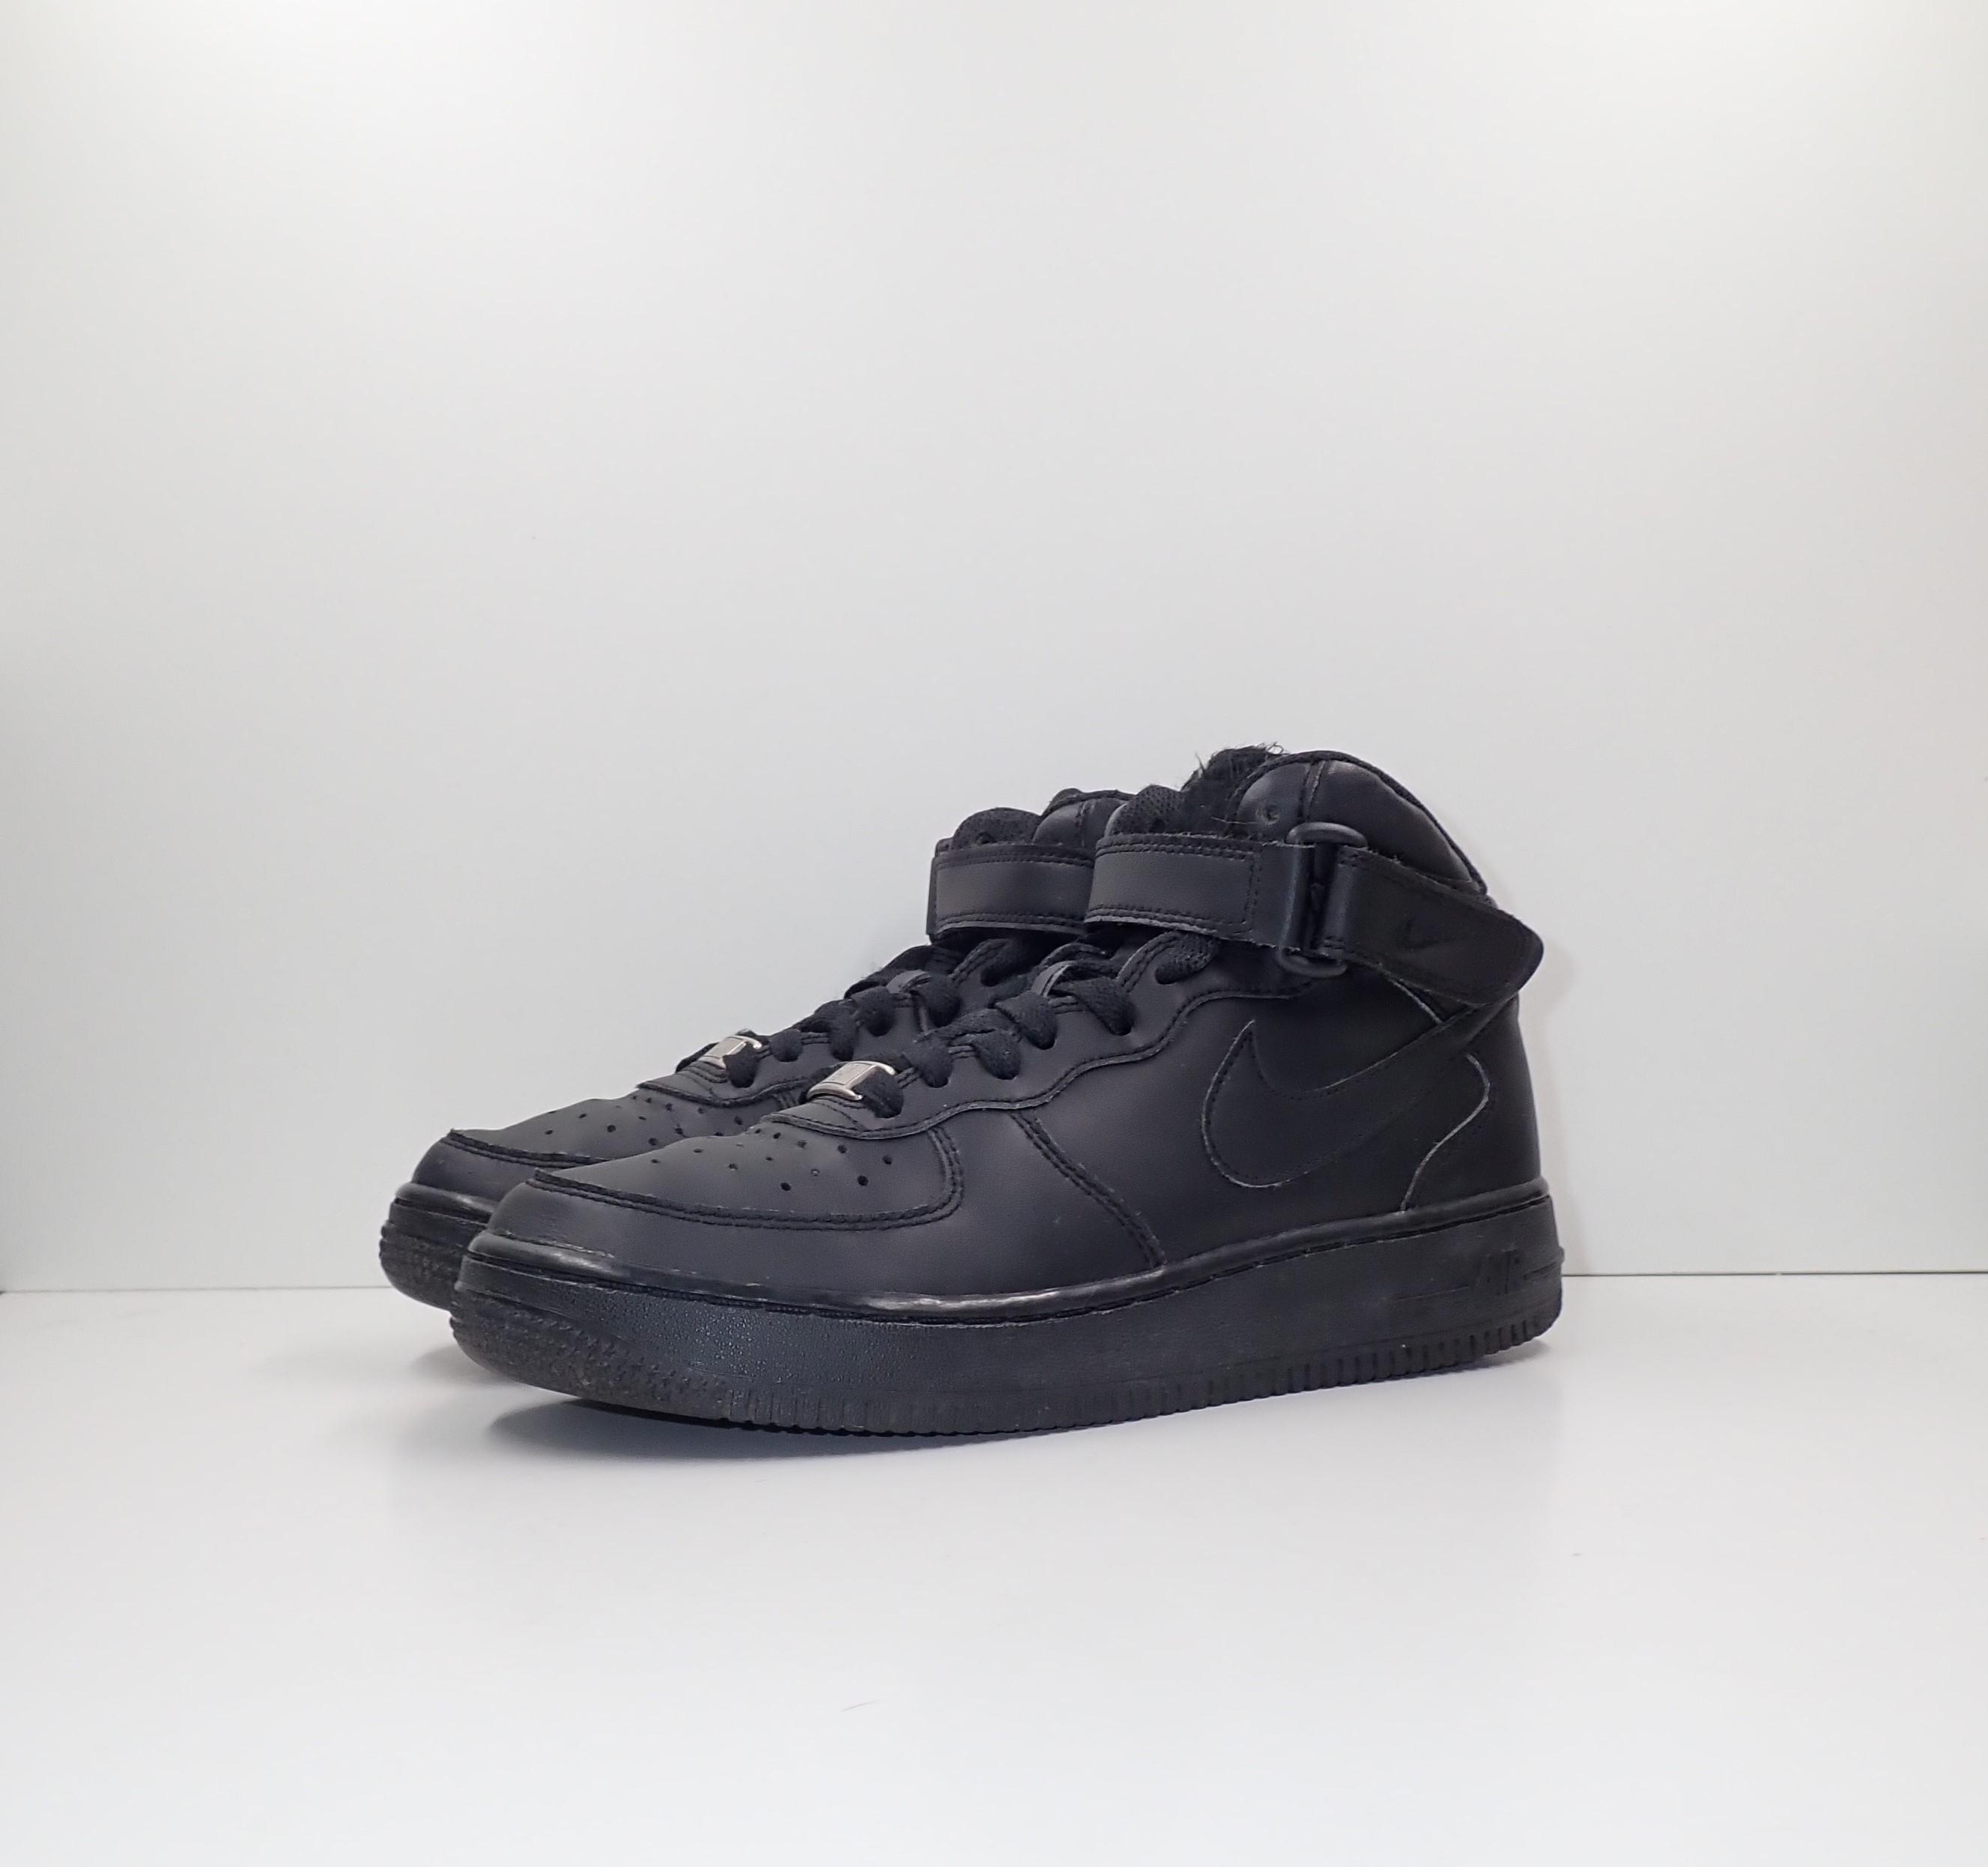 Nike Air Force 1 Mid Black (GS)